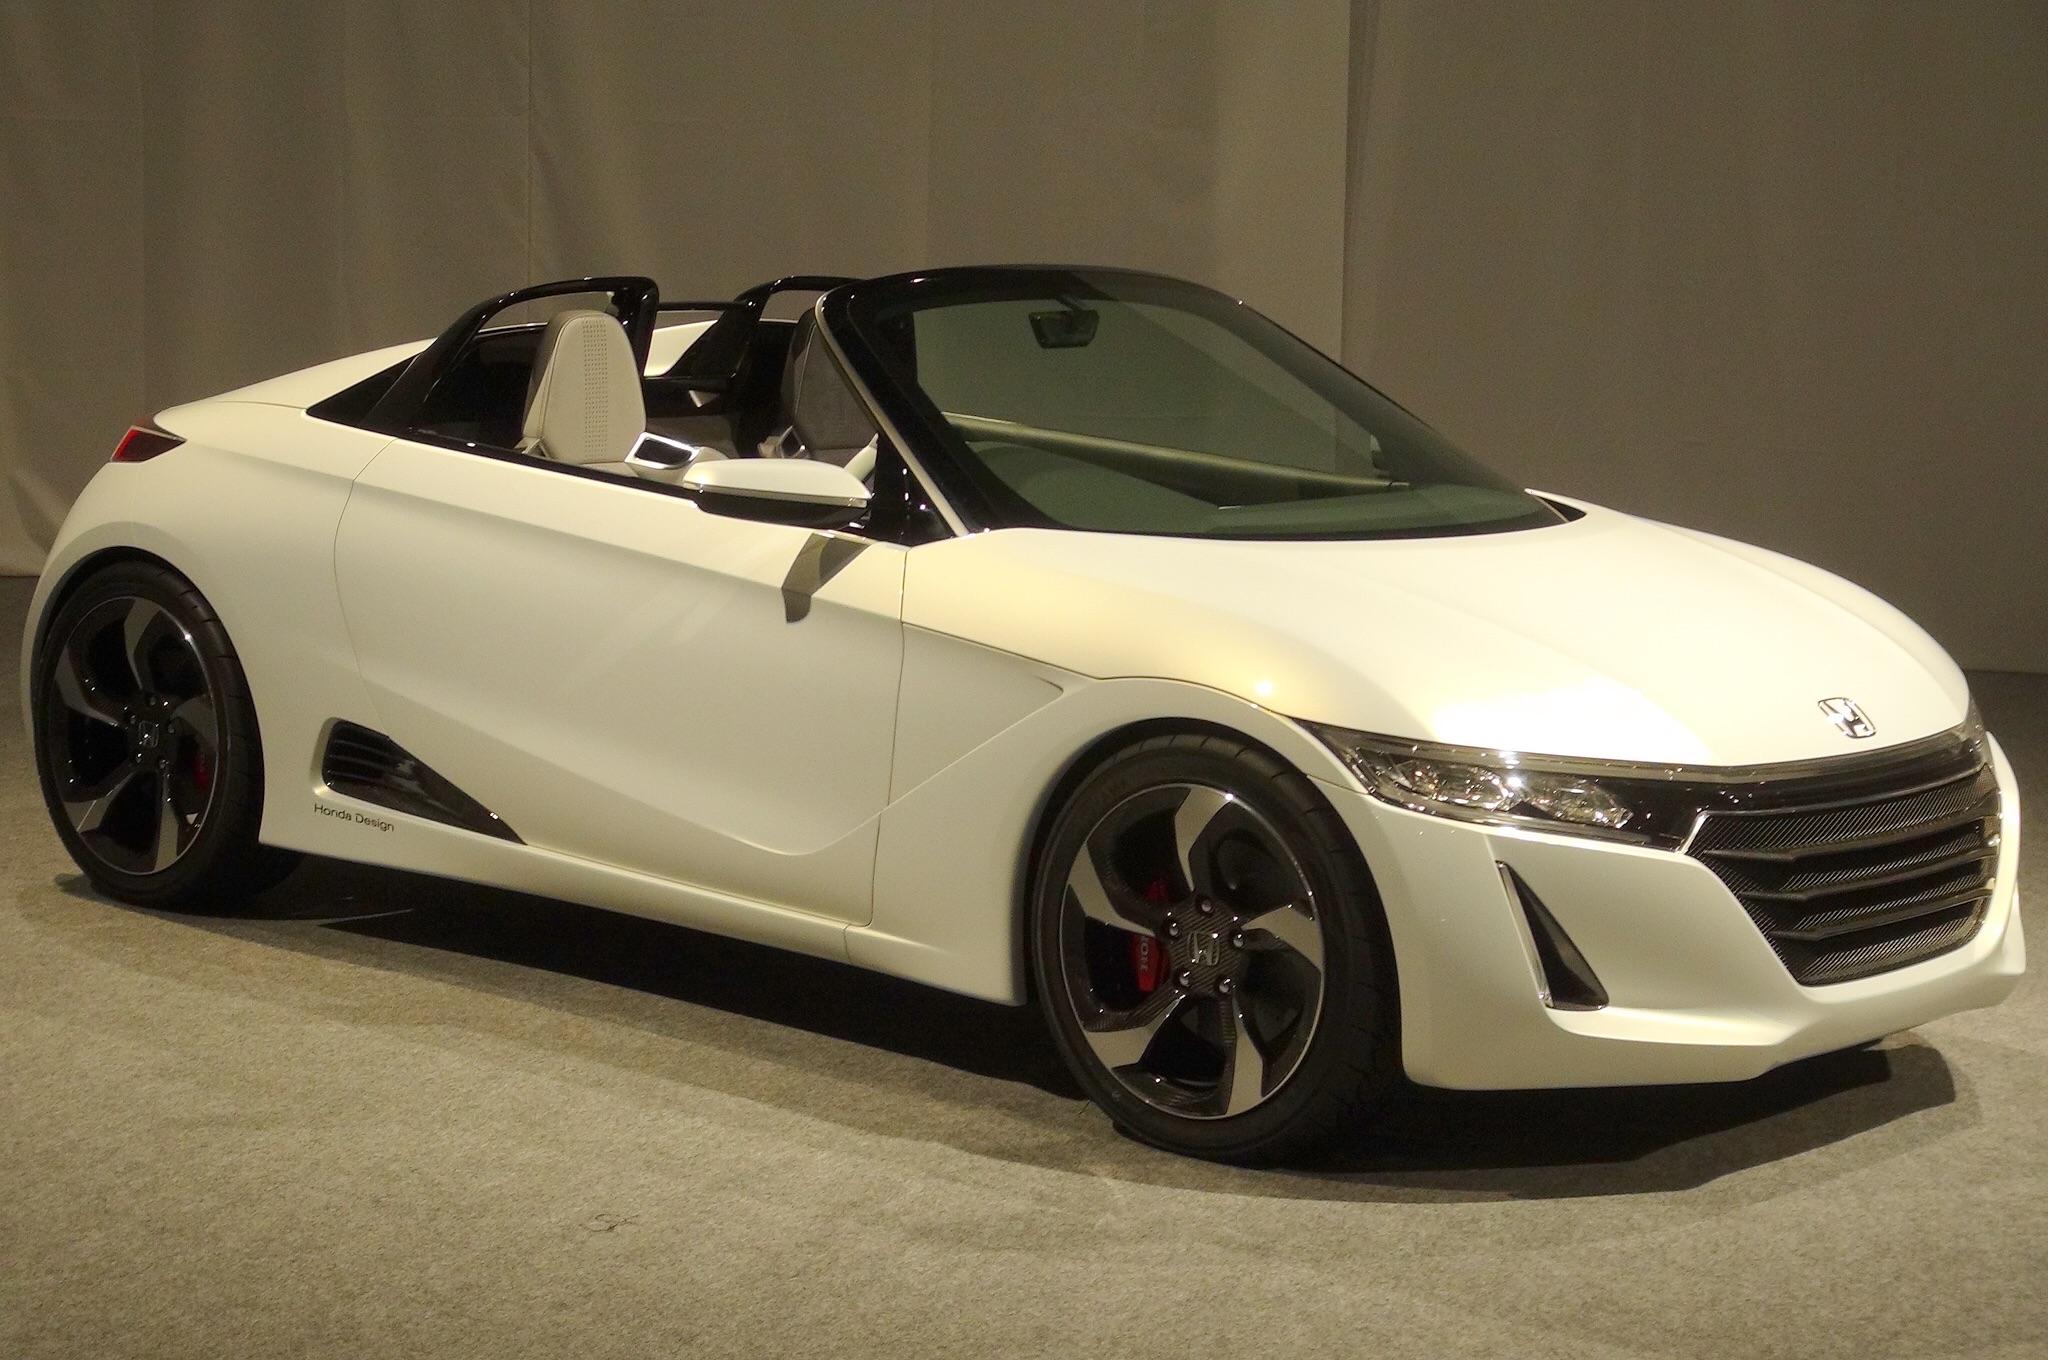 Honda S660 1 Liter Turbo 127 Bhp I Like